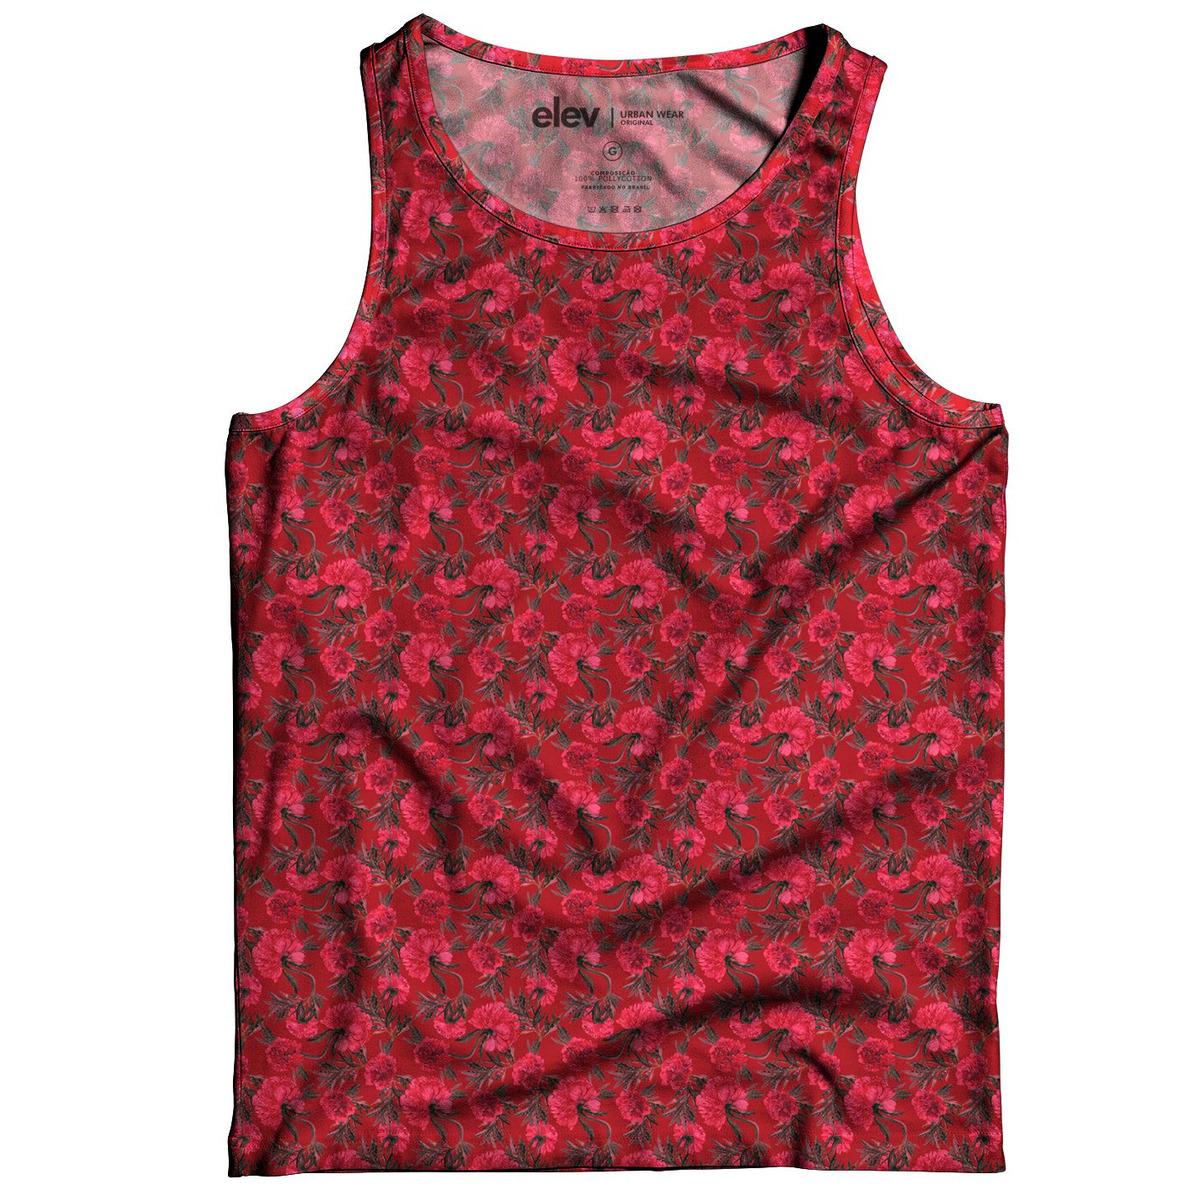 b1b1436ffb camiseta regata masculina floral praia - mais estilo. Carregando zoom.